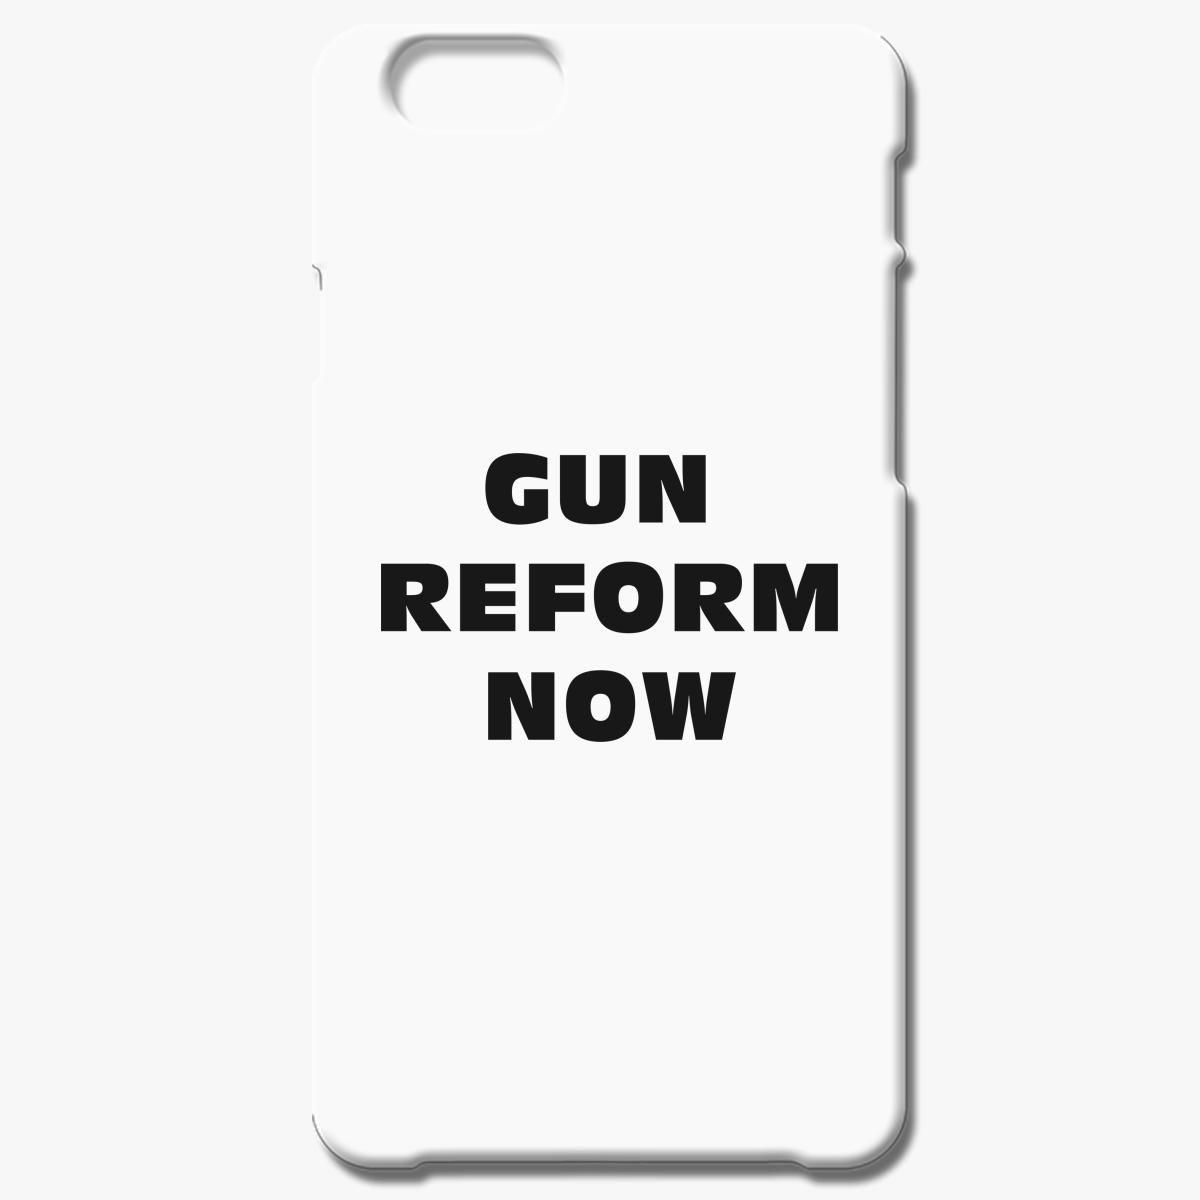 Gun Reform Now Iphone 6 6s Plus Case